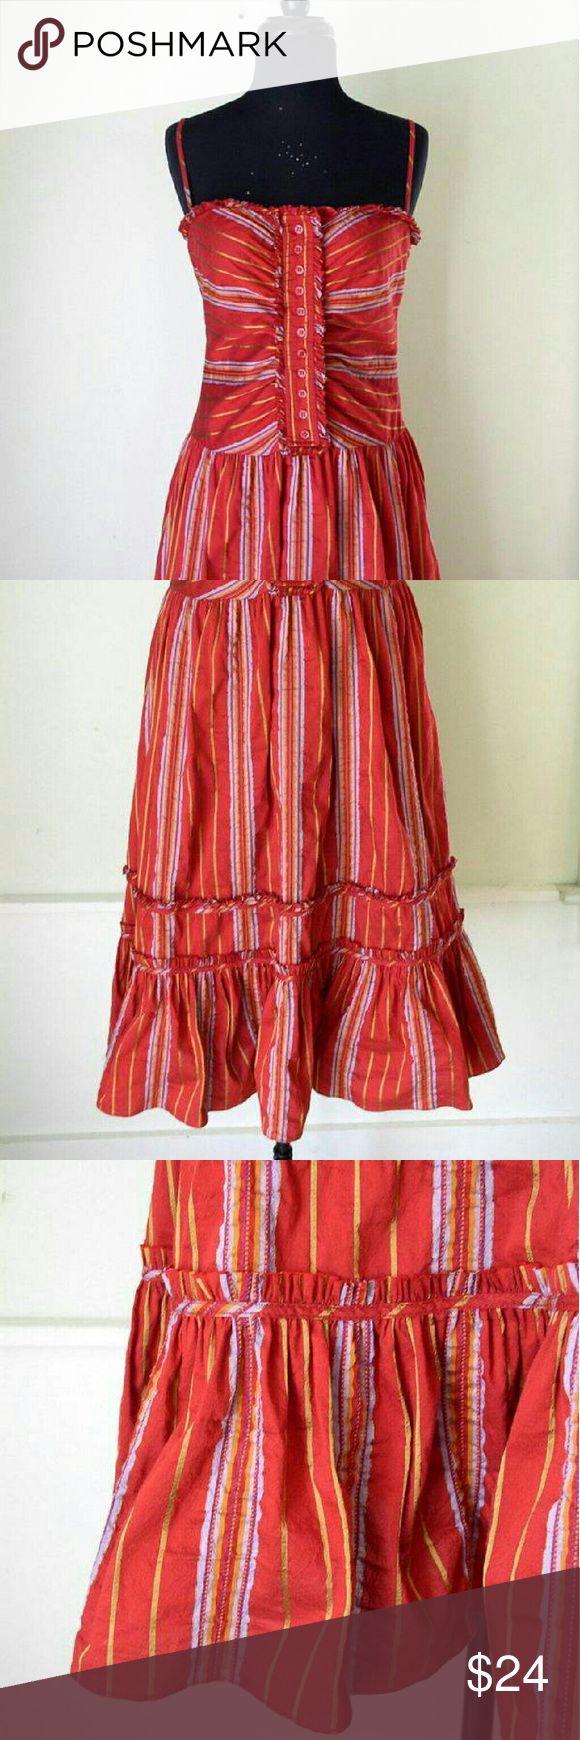 Zara Boho Drop Waist Red Metallic Festival Dress Zara boho dress in a luscious red cotton with stripes in  deep metallics like copper & gold. Drop waist, tiered boho midi skirt. Hidden side seam zipper. Cotton blend. Size Medium in excellent pre-owned condition Zara Dresses Midi